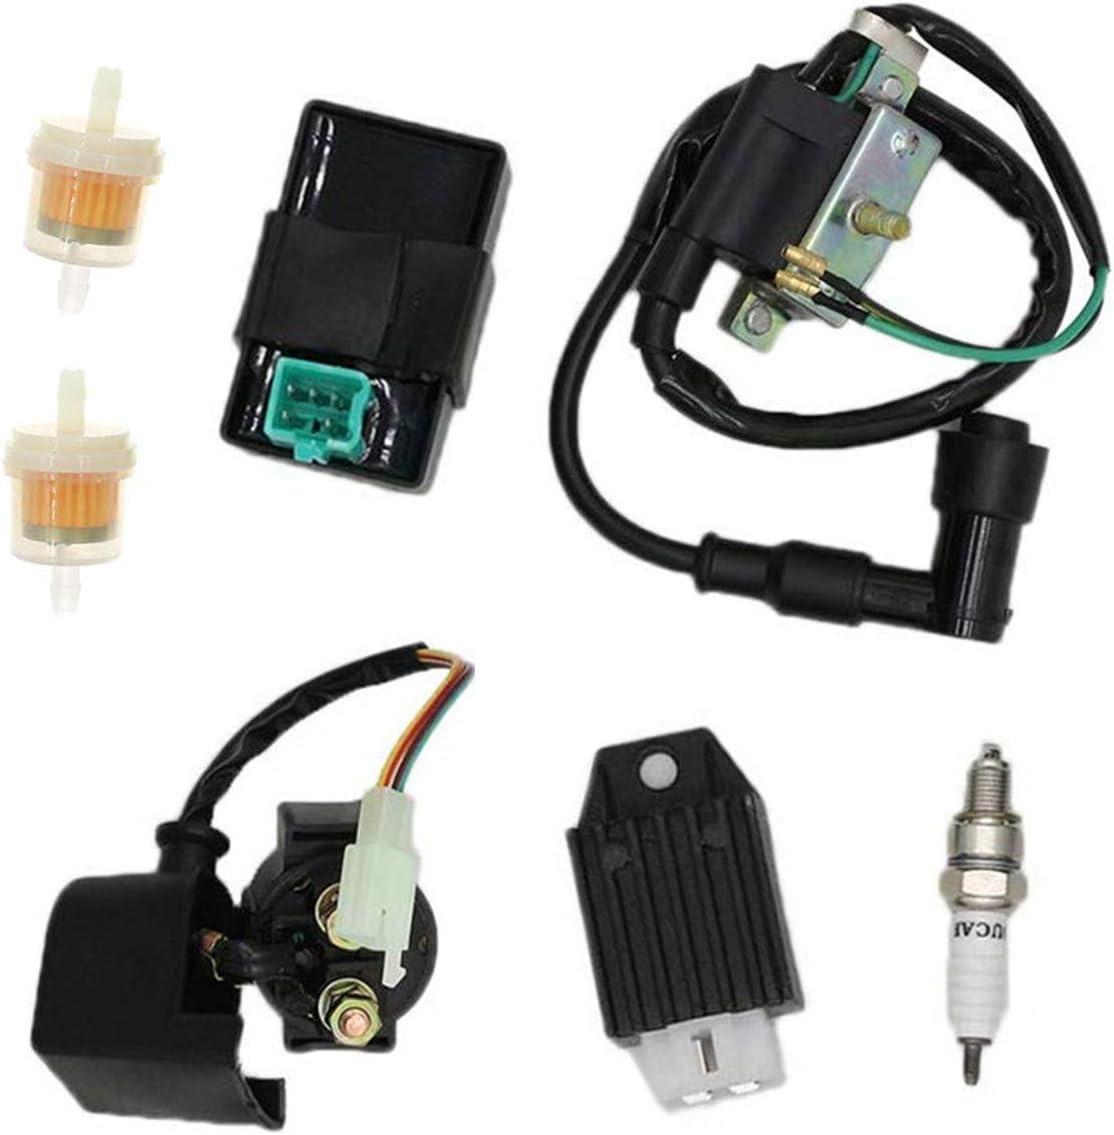 Ignition Coil AC CDI Box 50cc 70cc 90cc 110cc 125cc TATV Go Kart Taotao Coolster